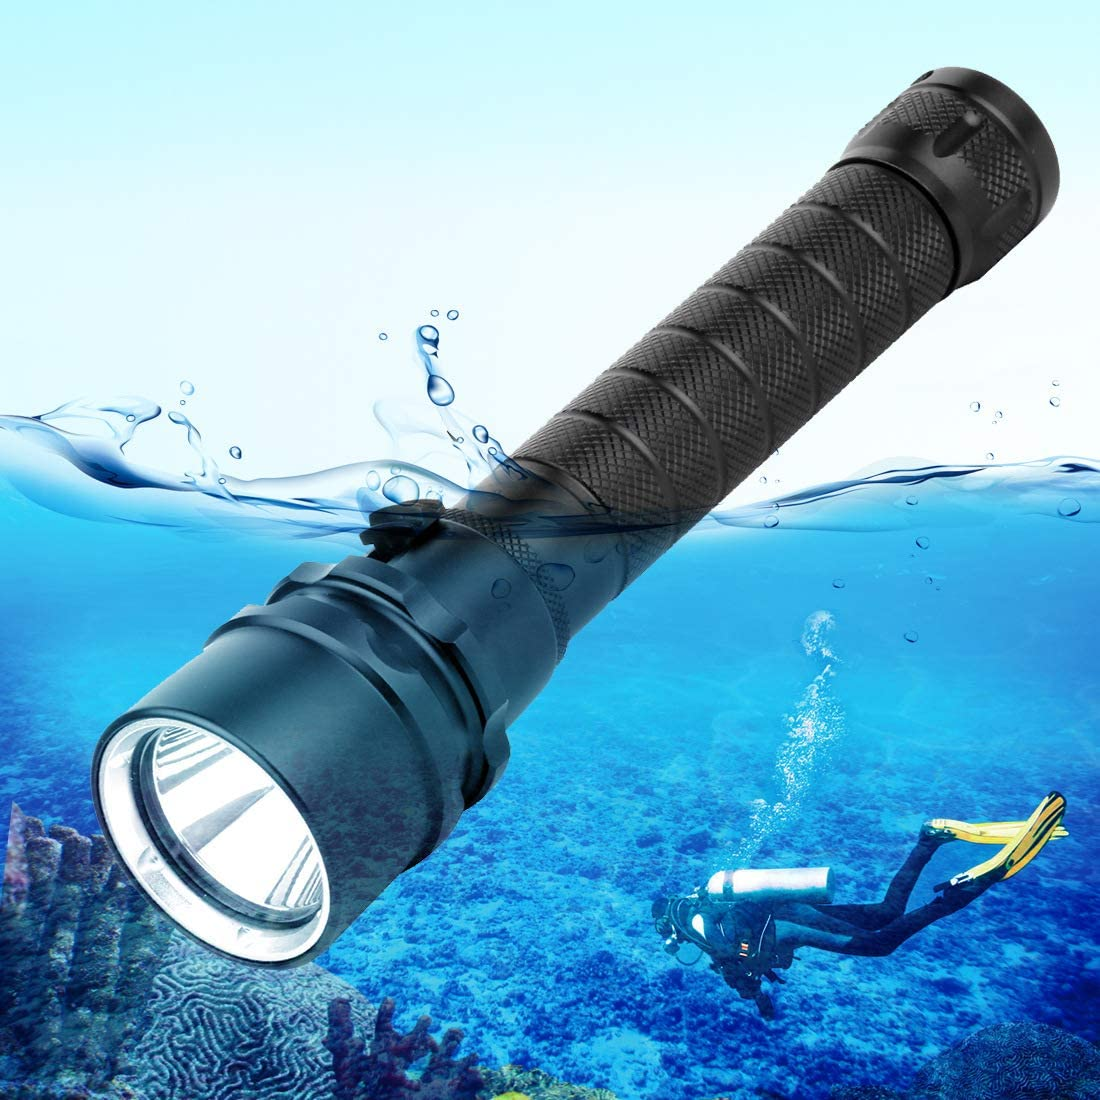 Haofy Diving Flashlight Dive Torch 5000 Lumen IP68 Waterproof Underwater Lights 80M Scuba Diving Flashlight with 3 Lighting Modes Submarine Lights